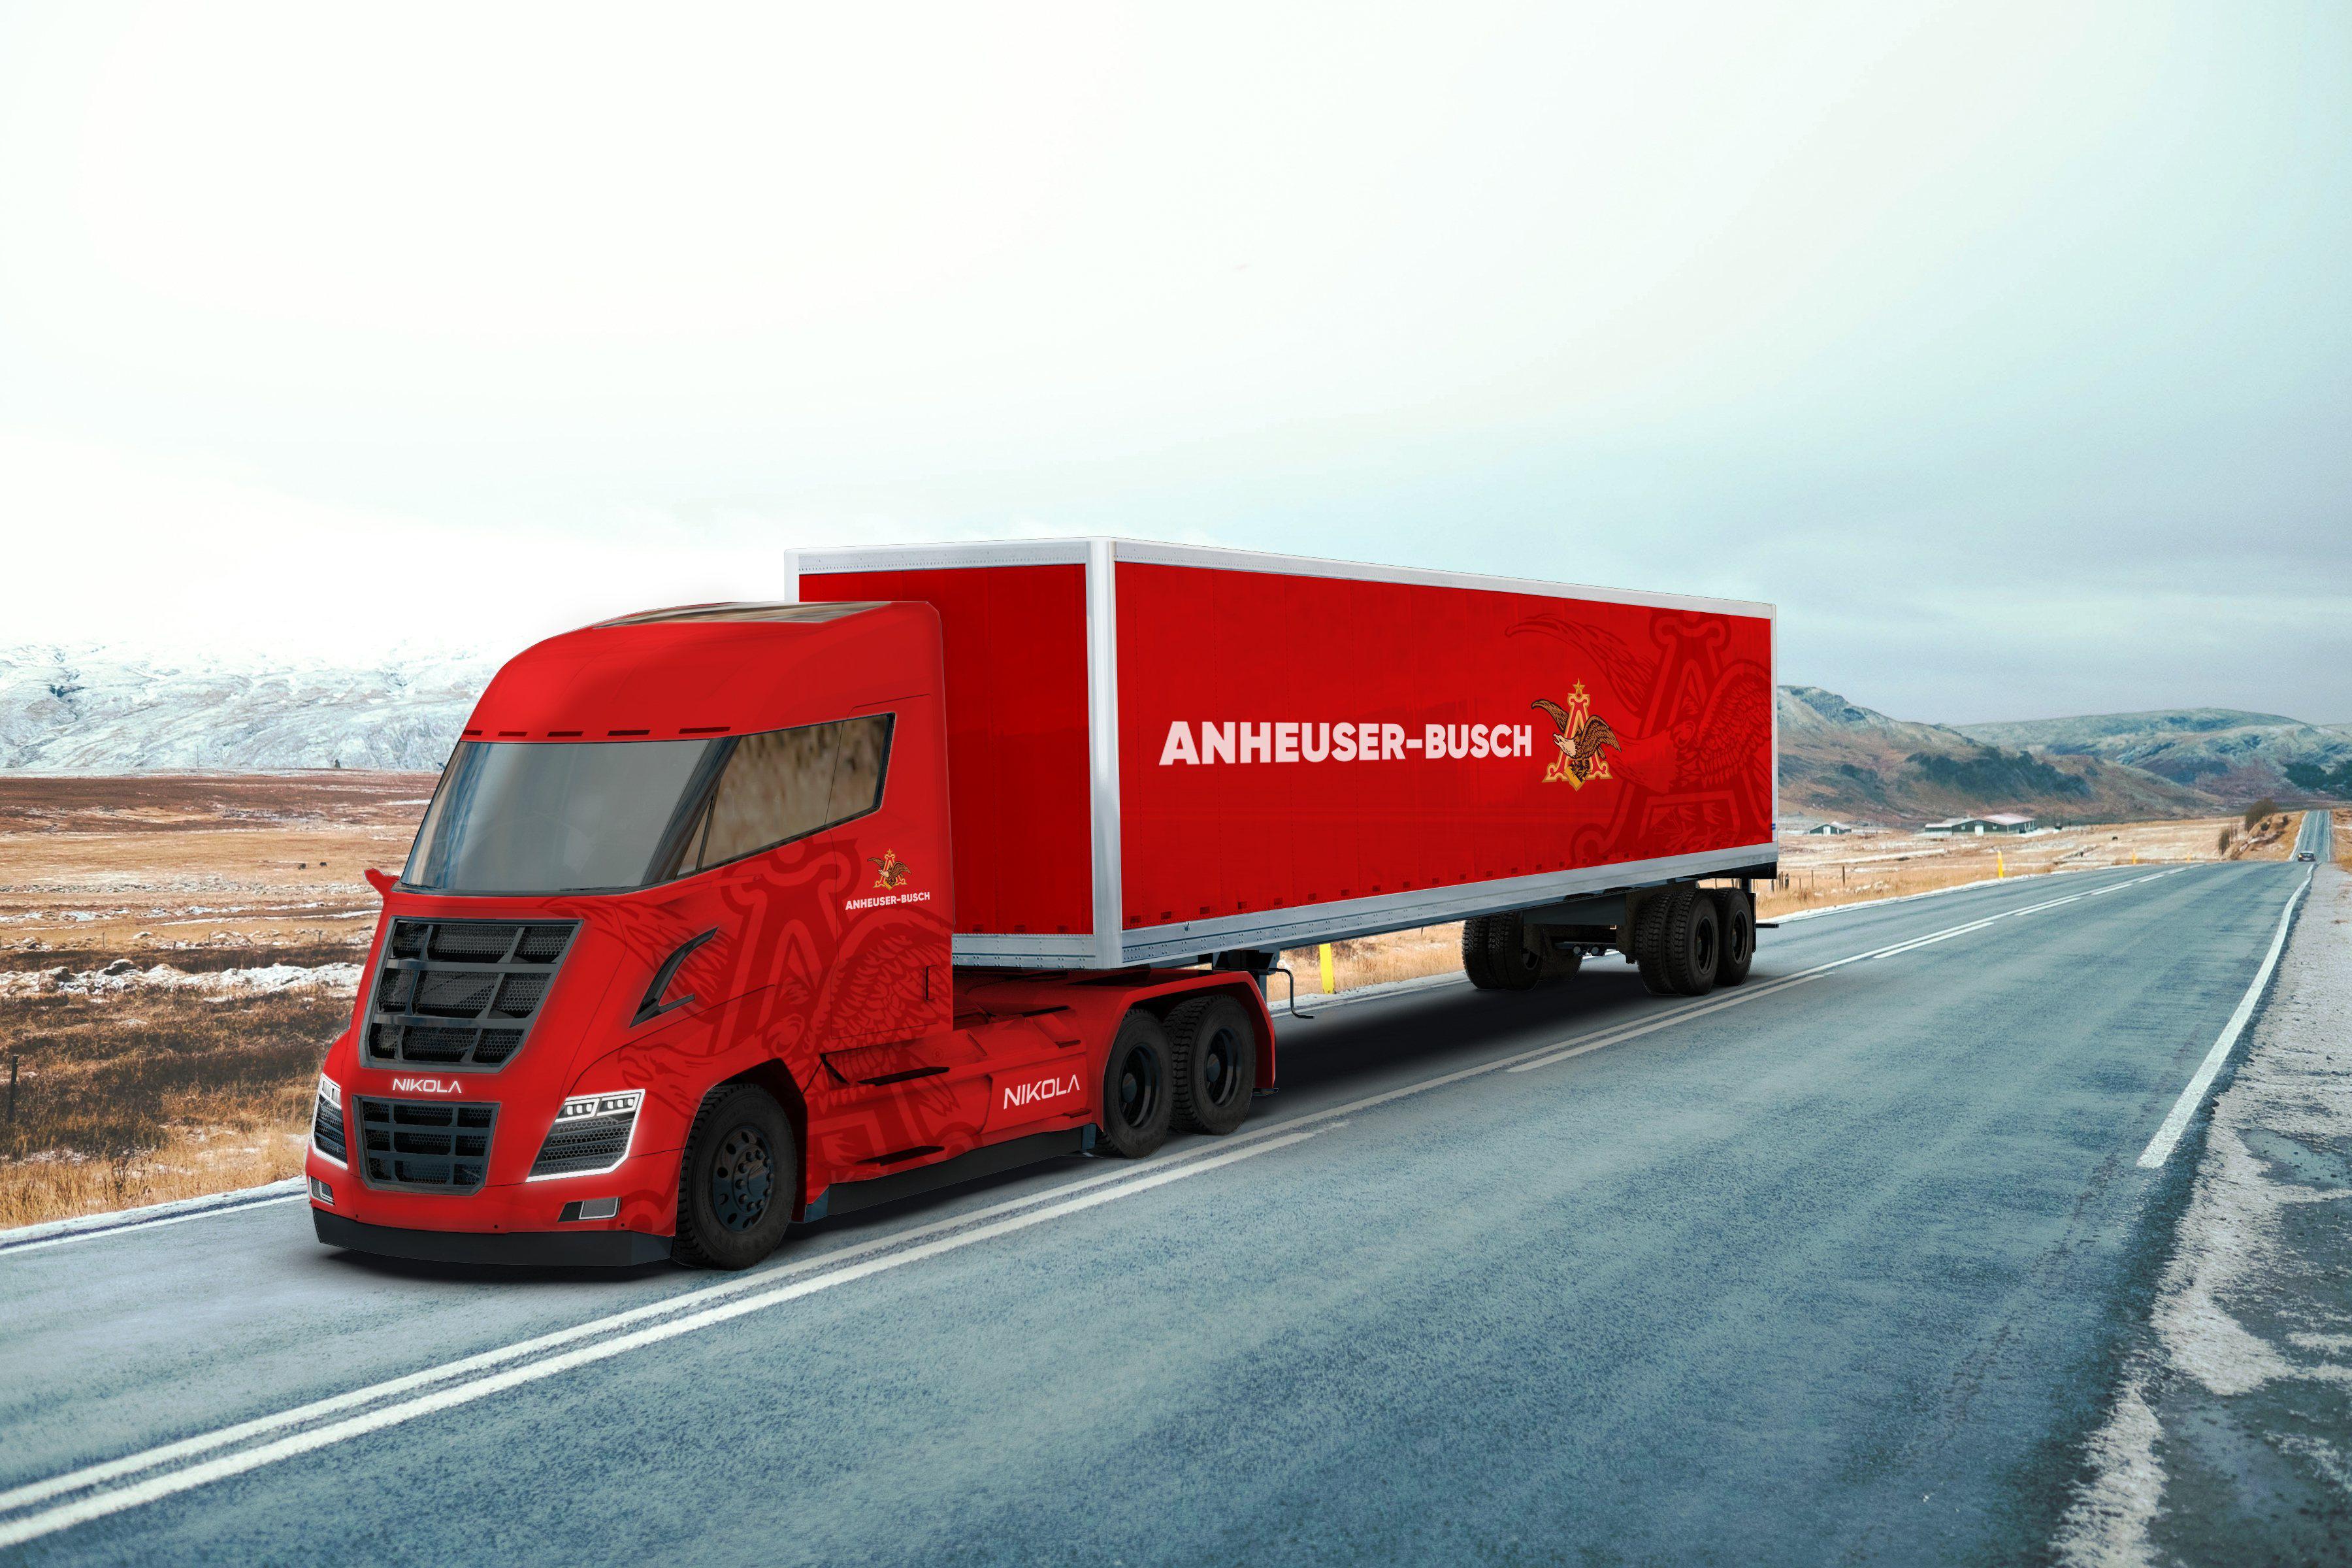 Nikola Semi-Truck Pulling Anheuser-Busch Trailer